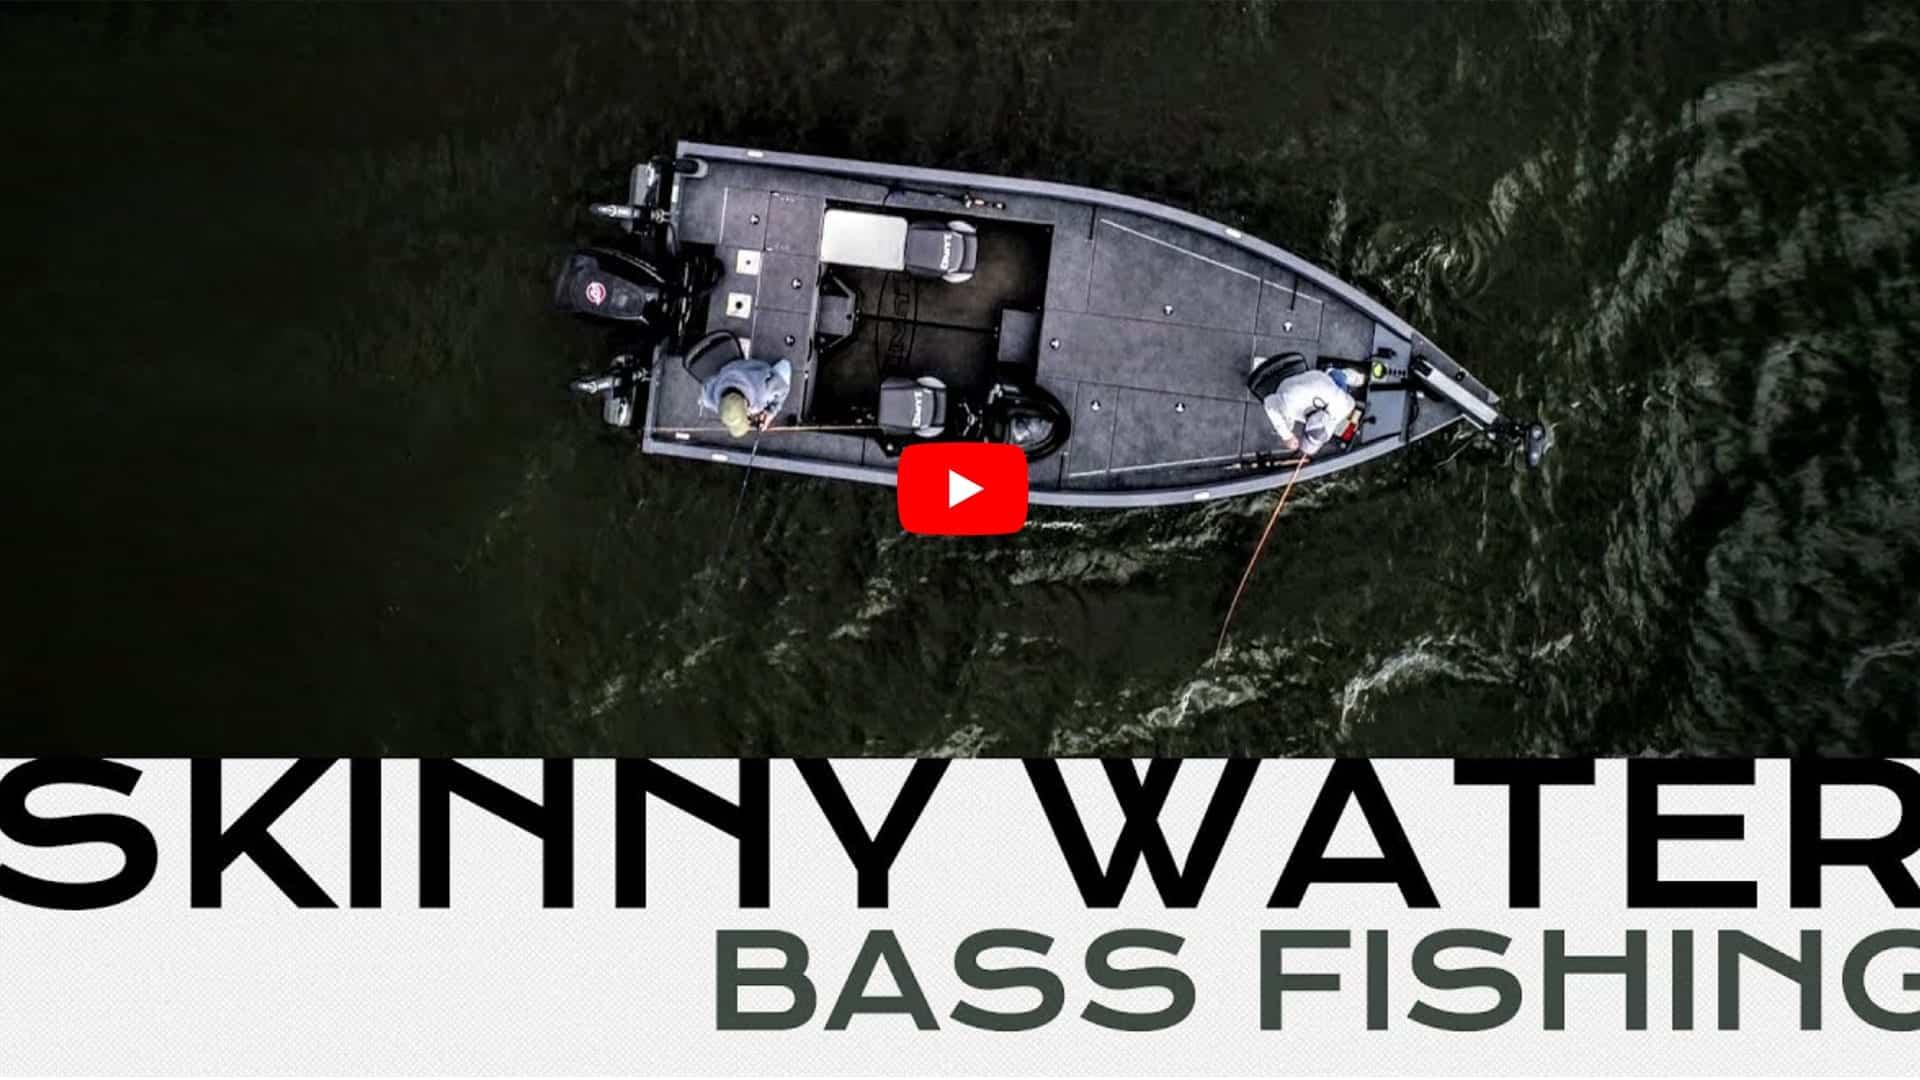 Followin' Largemouth Bass